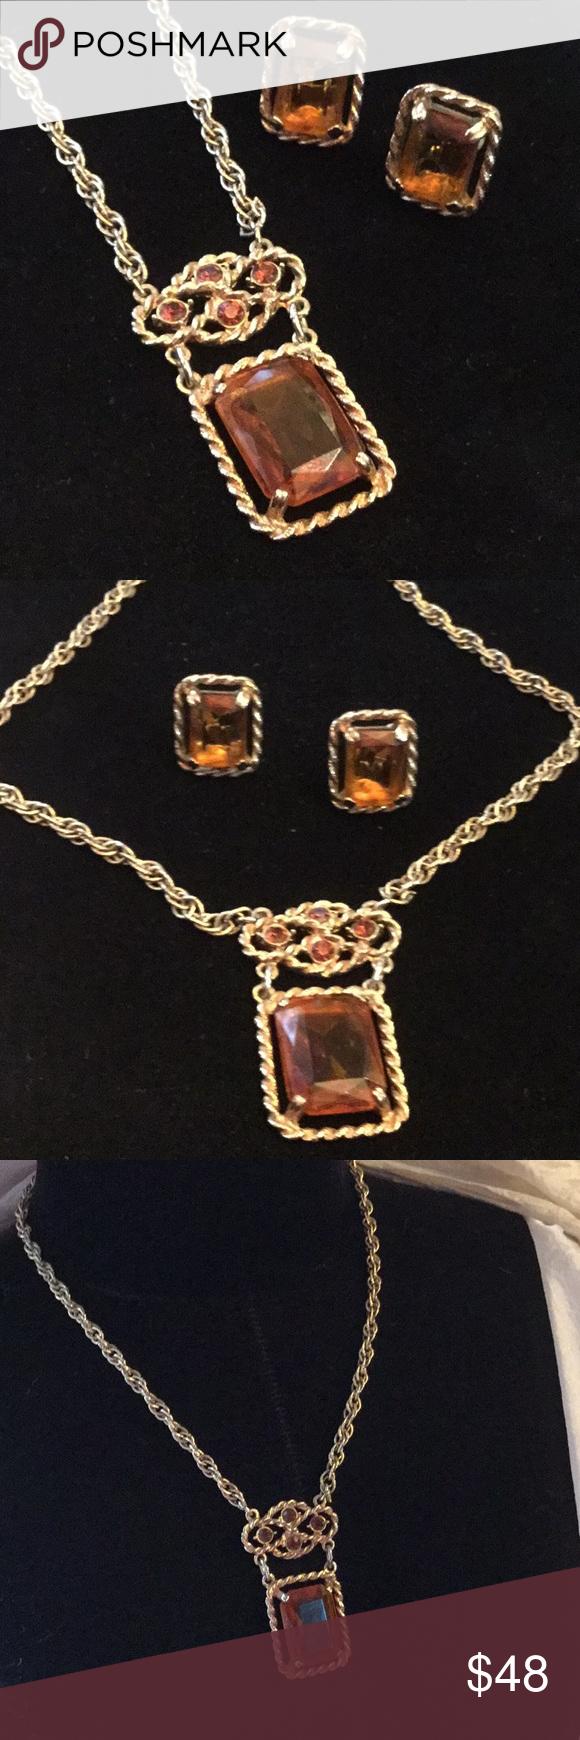 Exquisite antique necklace u earring set imperial topaz antique